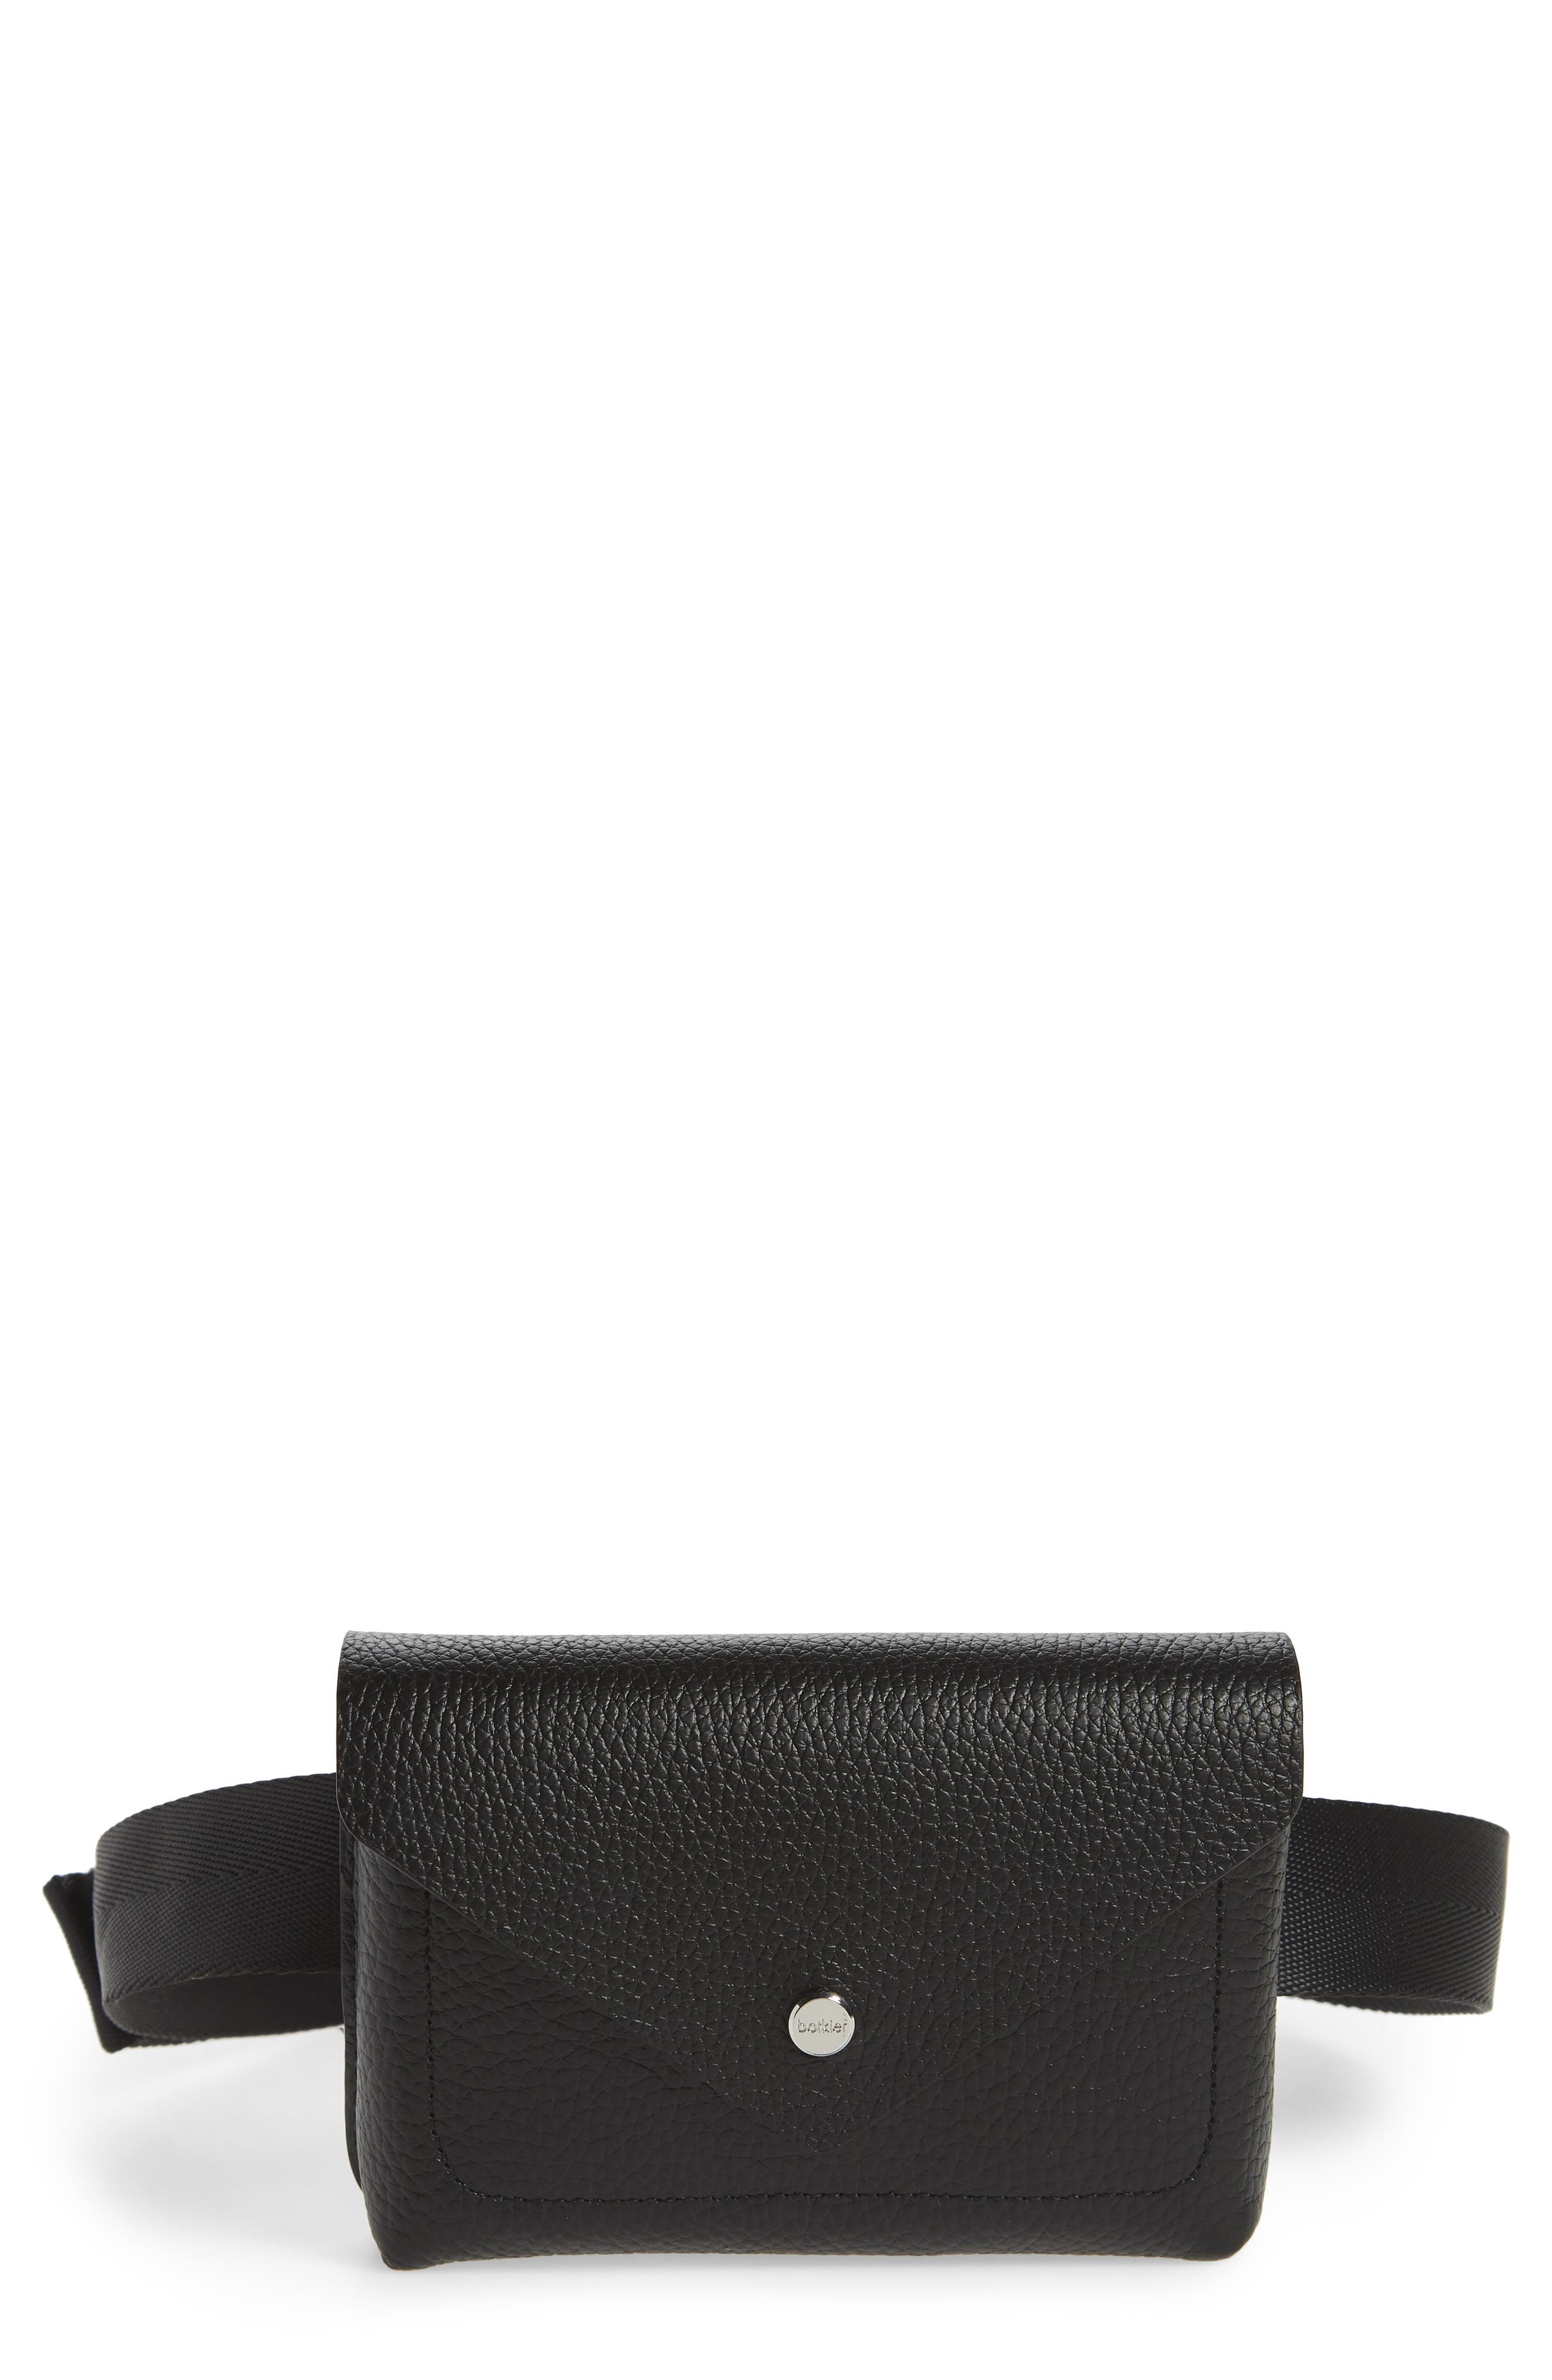 Vivi Calfskin Leather Convertible Belt Bag,                         Main,                         color, BLACK